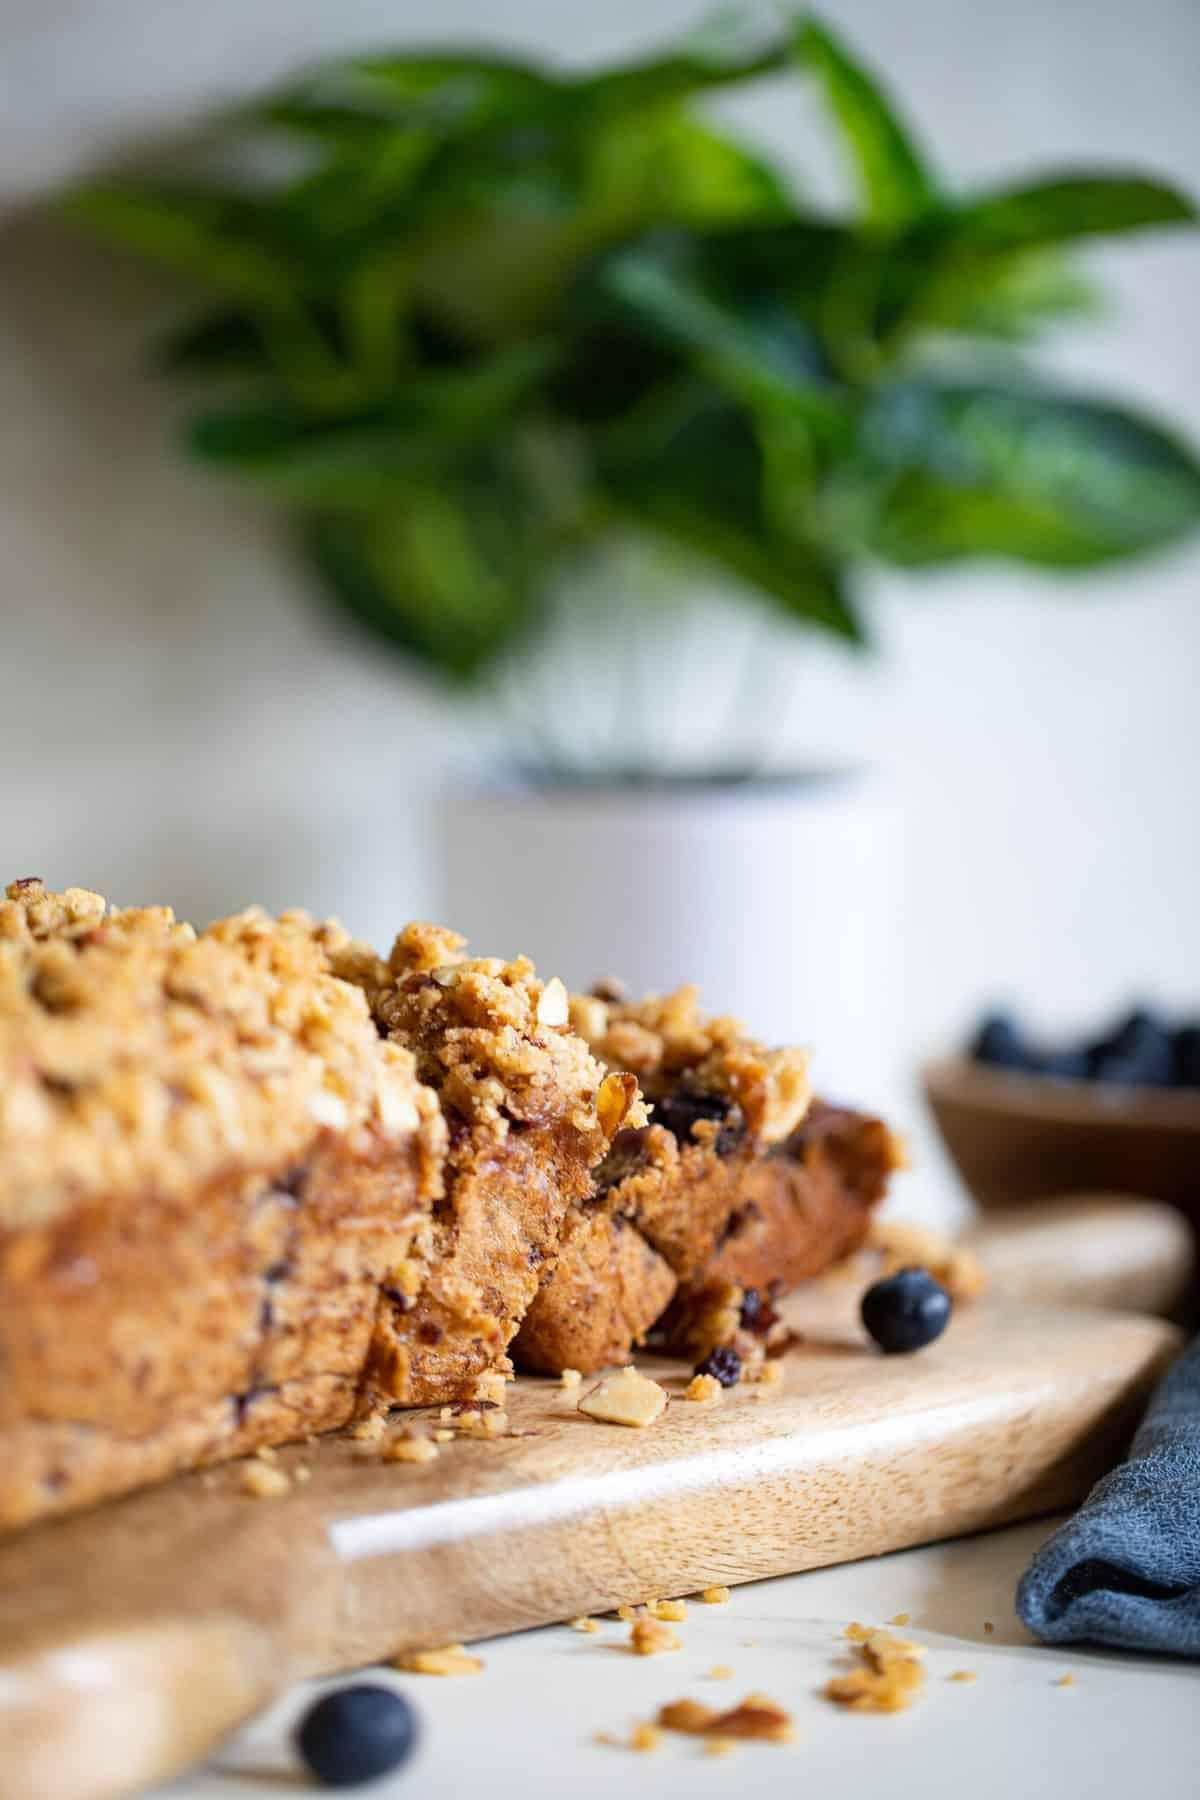 Almond-Cinnamon Crunch Blueberry Banana Bread